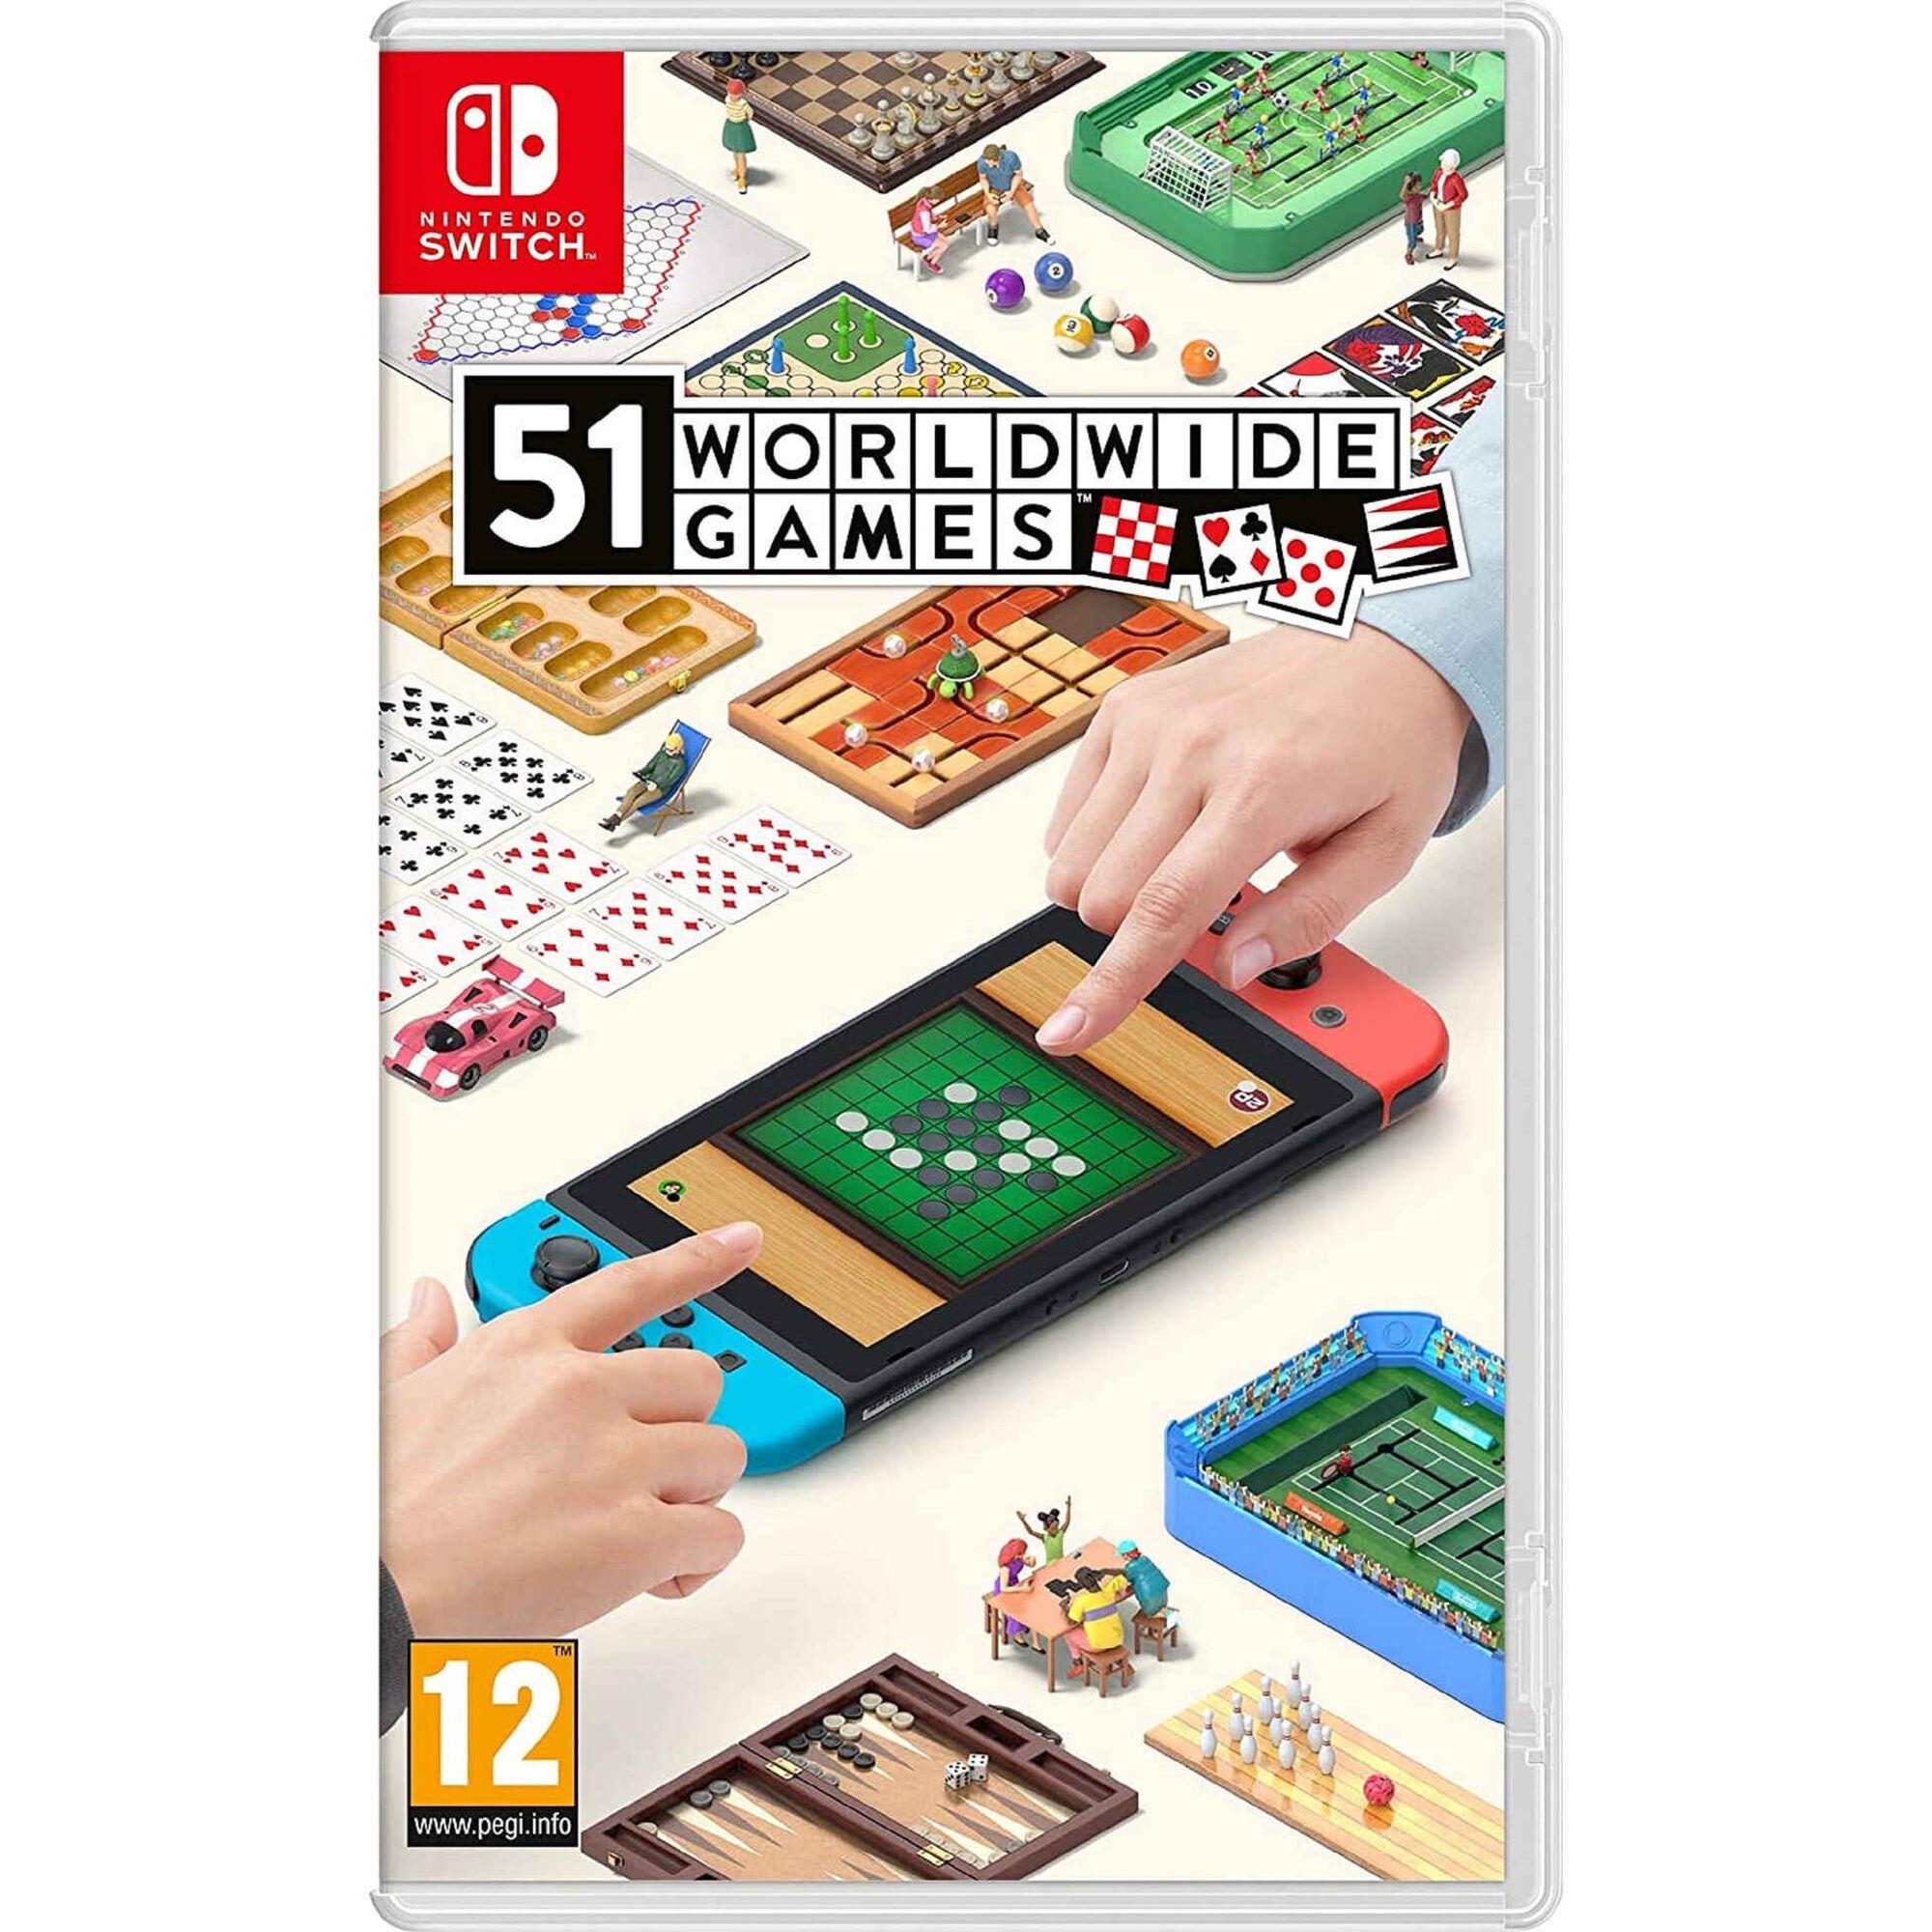 Jogo Nintendo Switch 51 Worldwide Games